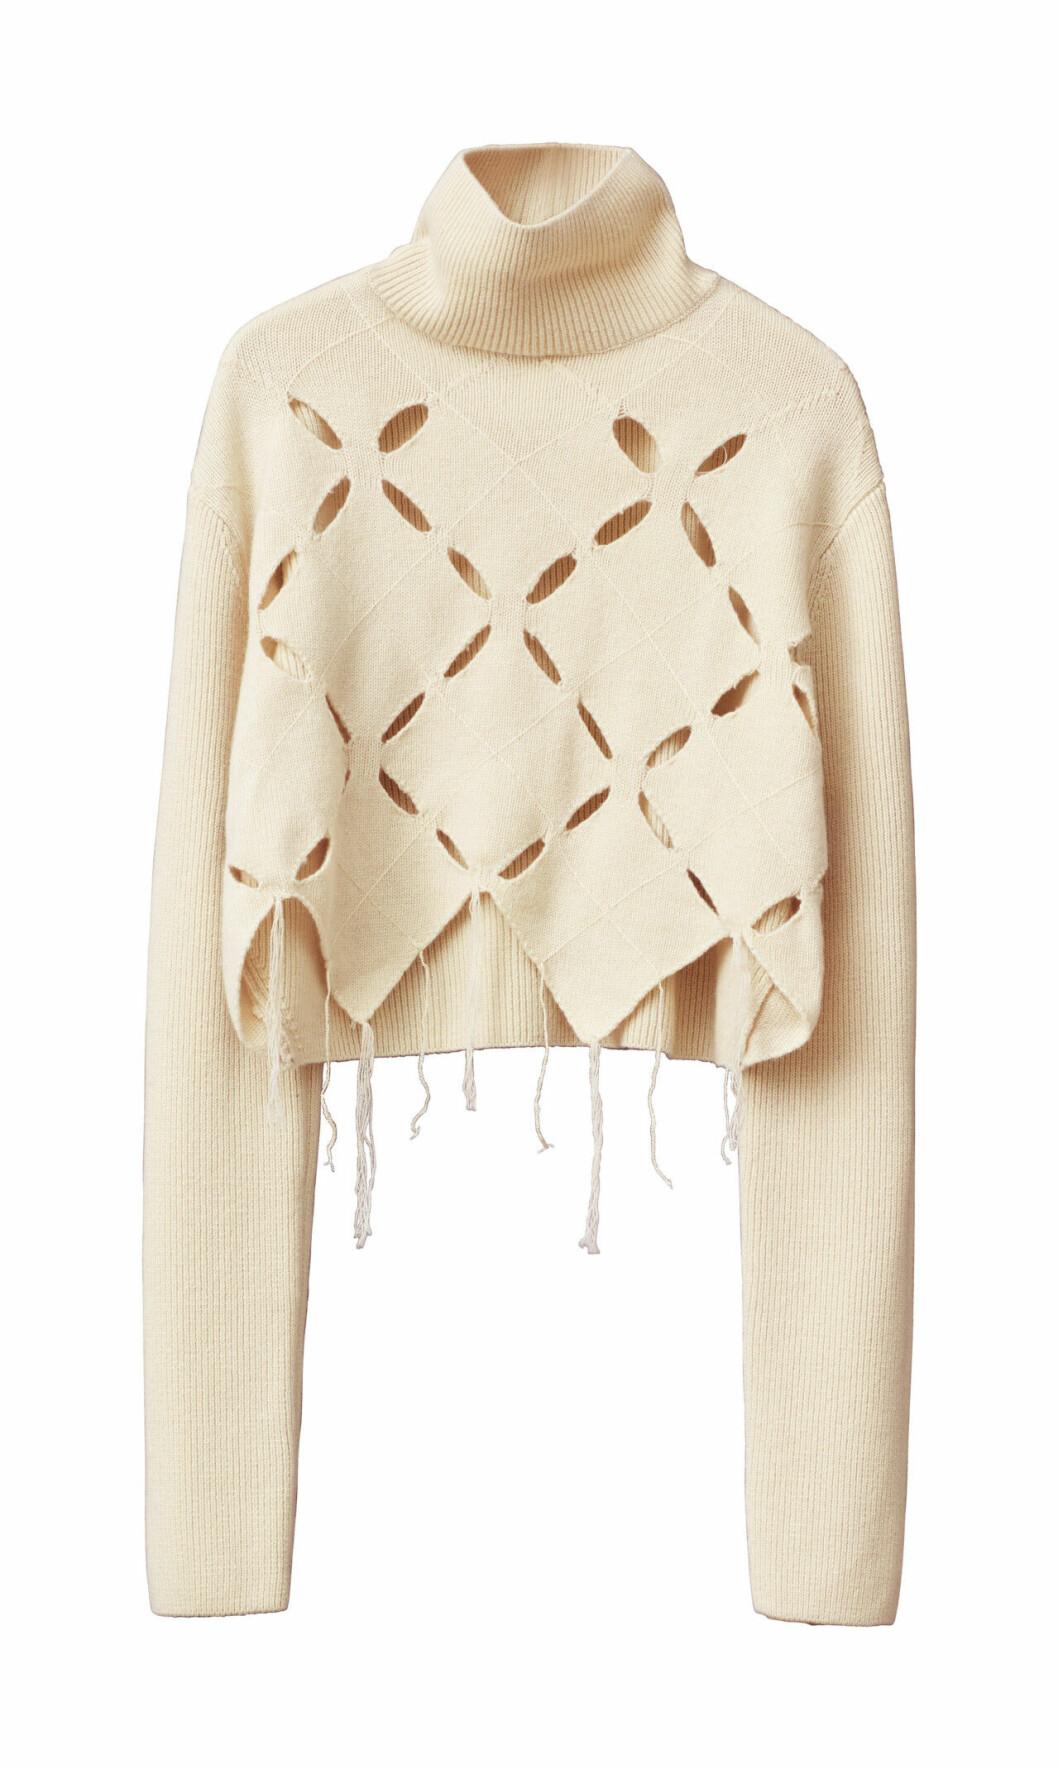 H&M Studio höstkollektion aw 2019 – stickad polo i vitt